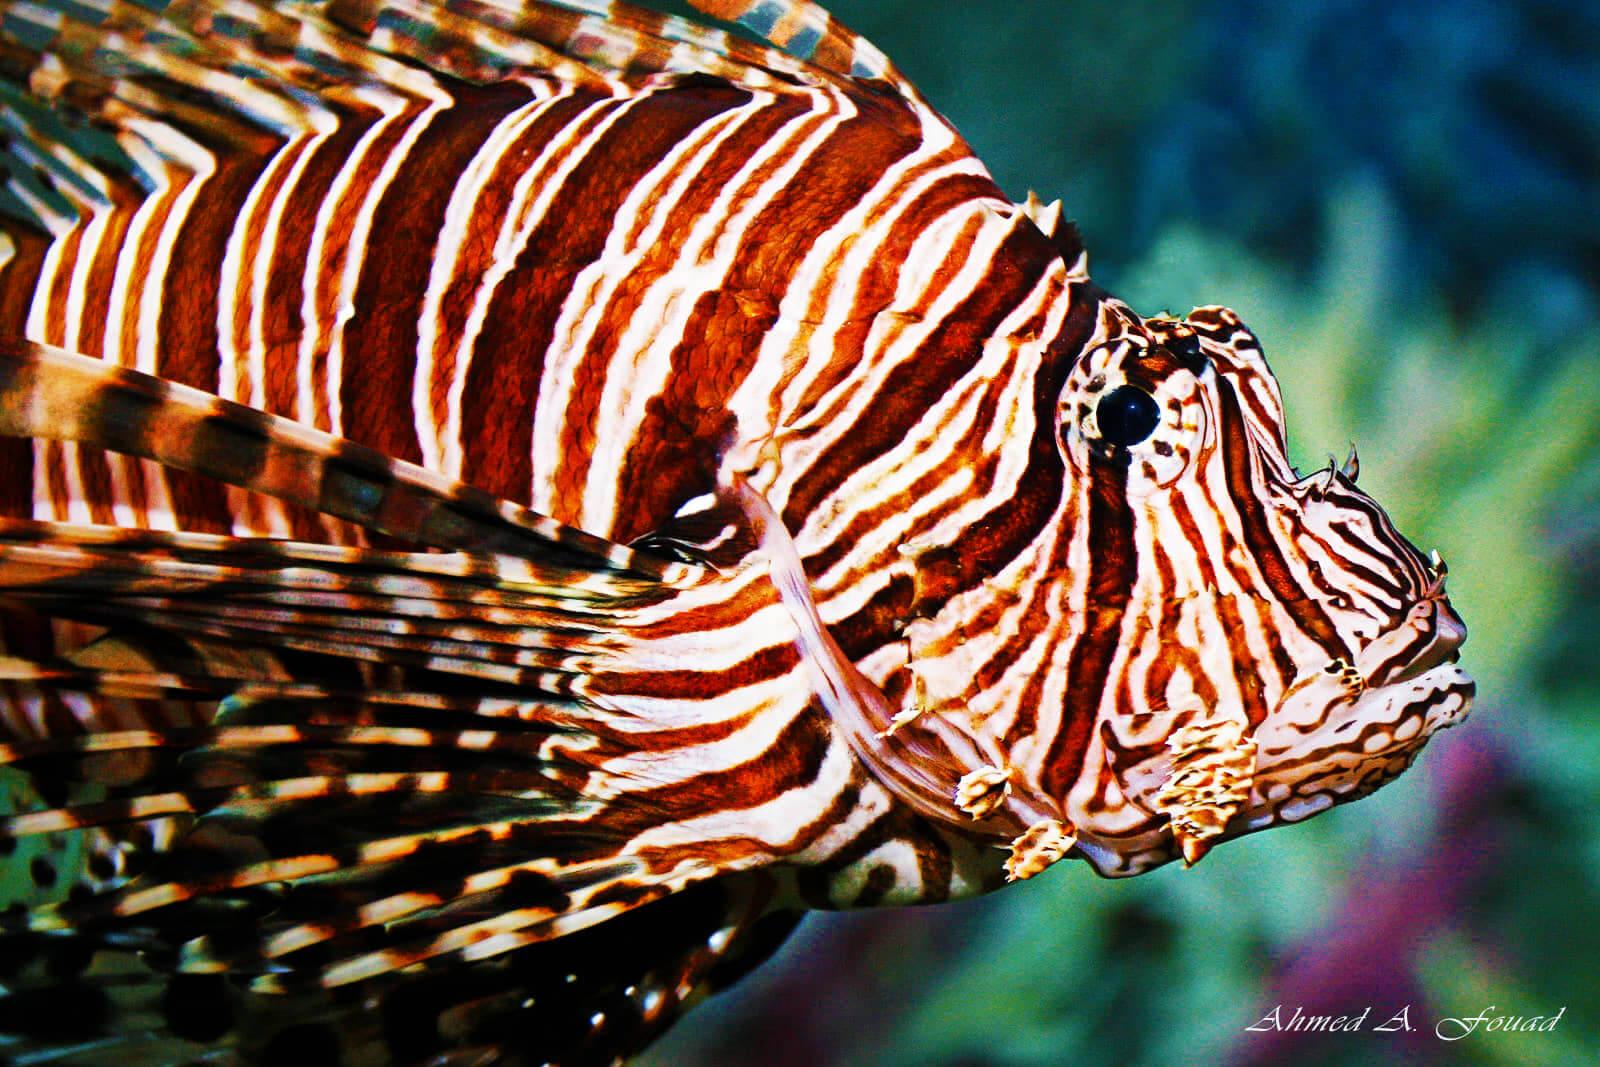 Egypt-REDSEA-Hurghada-DivePro-Academy-Scuba-Diving-Center-Lion-Fish-3